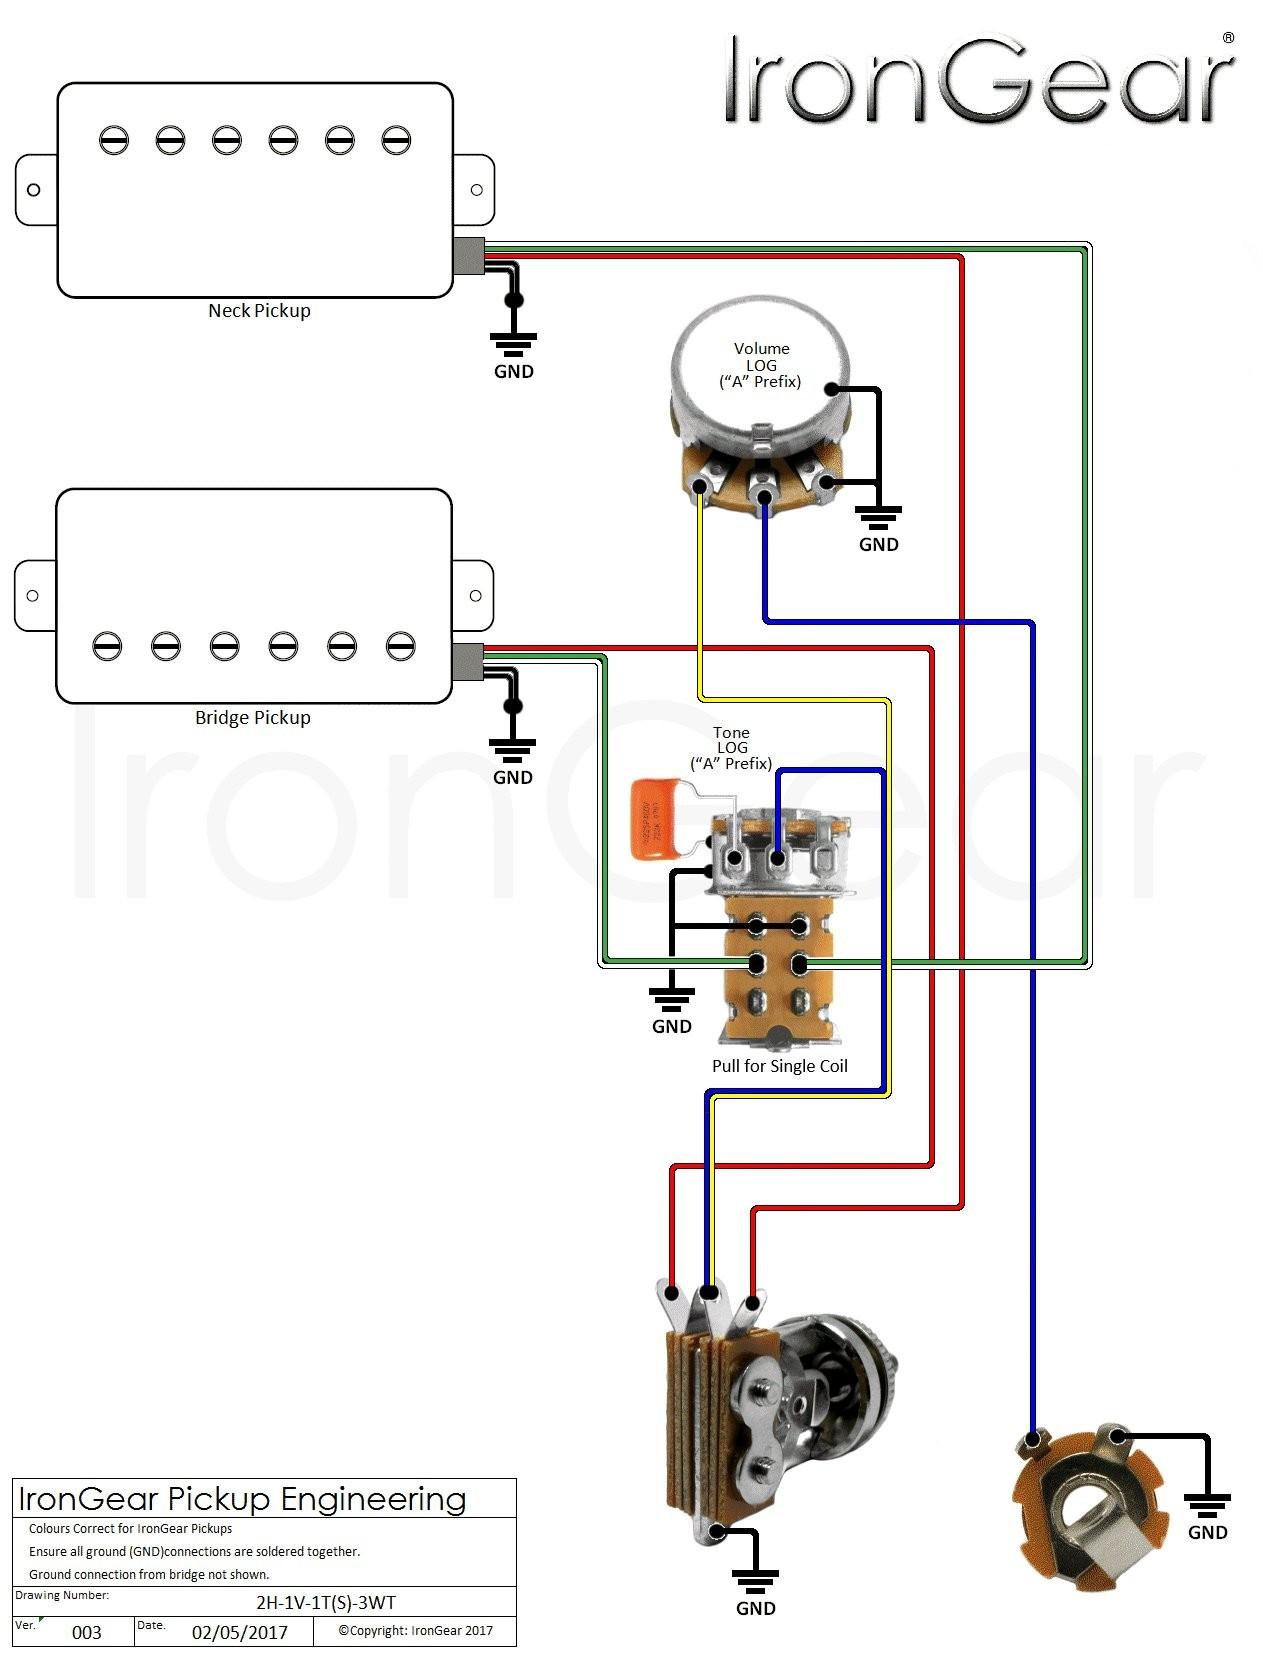 Scamatics Wiring Harness Engine Hum Wiring Diagram Used Engine Harness Wiring Scamatics Humm